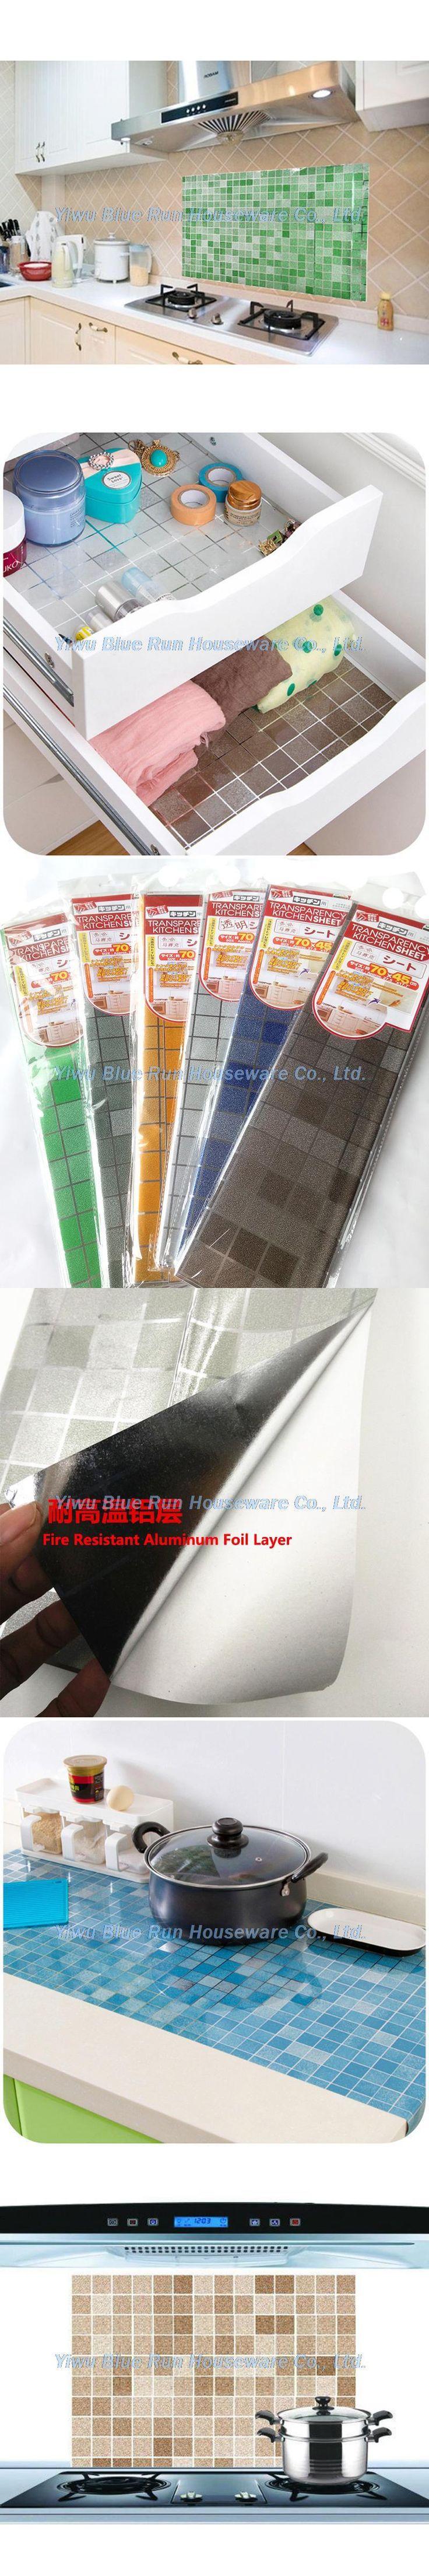 45x70CM Mosaic Aluminum Foil Self-adhensive Anti Oil Wallpaper for Kitchen Wall Sticker DIY Home Decor Kitchen Wallpaper